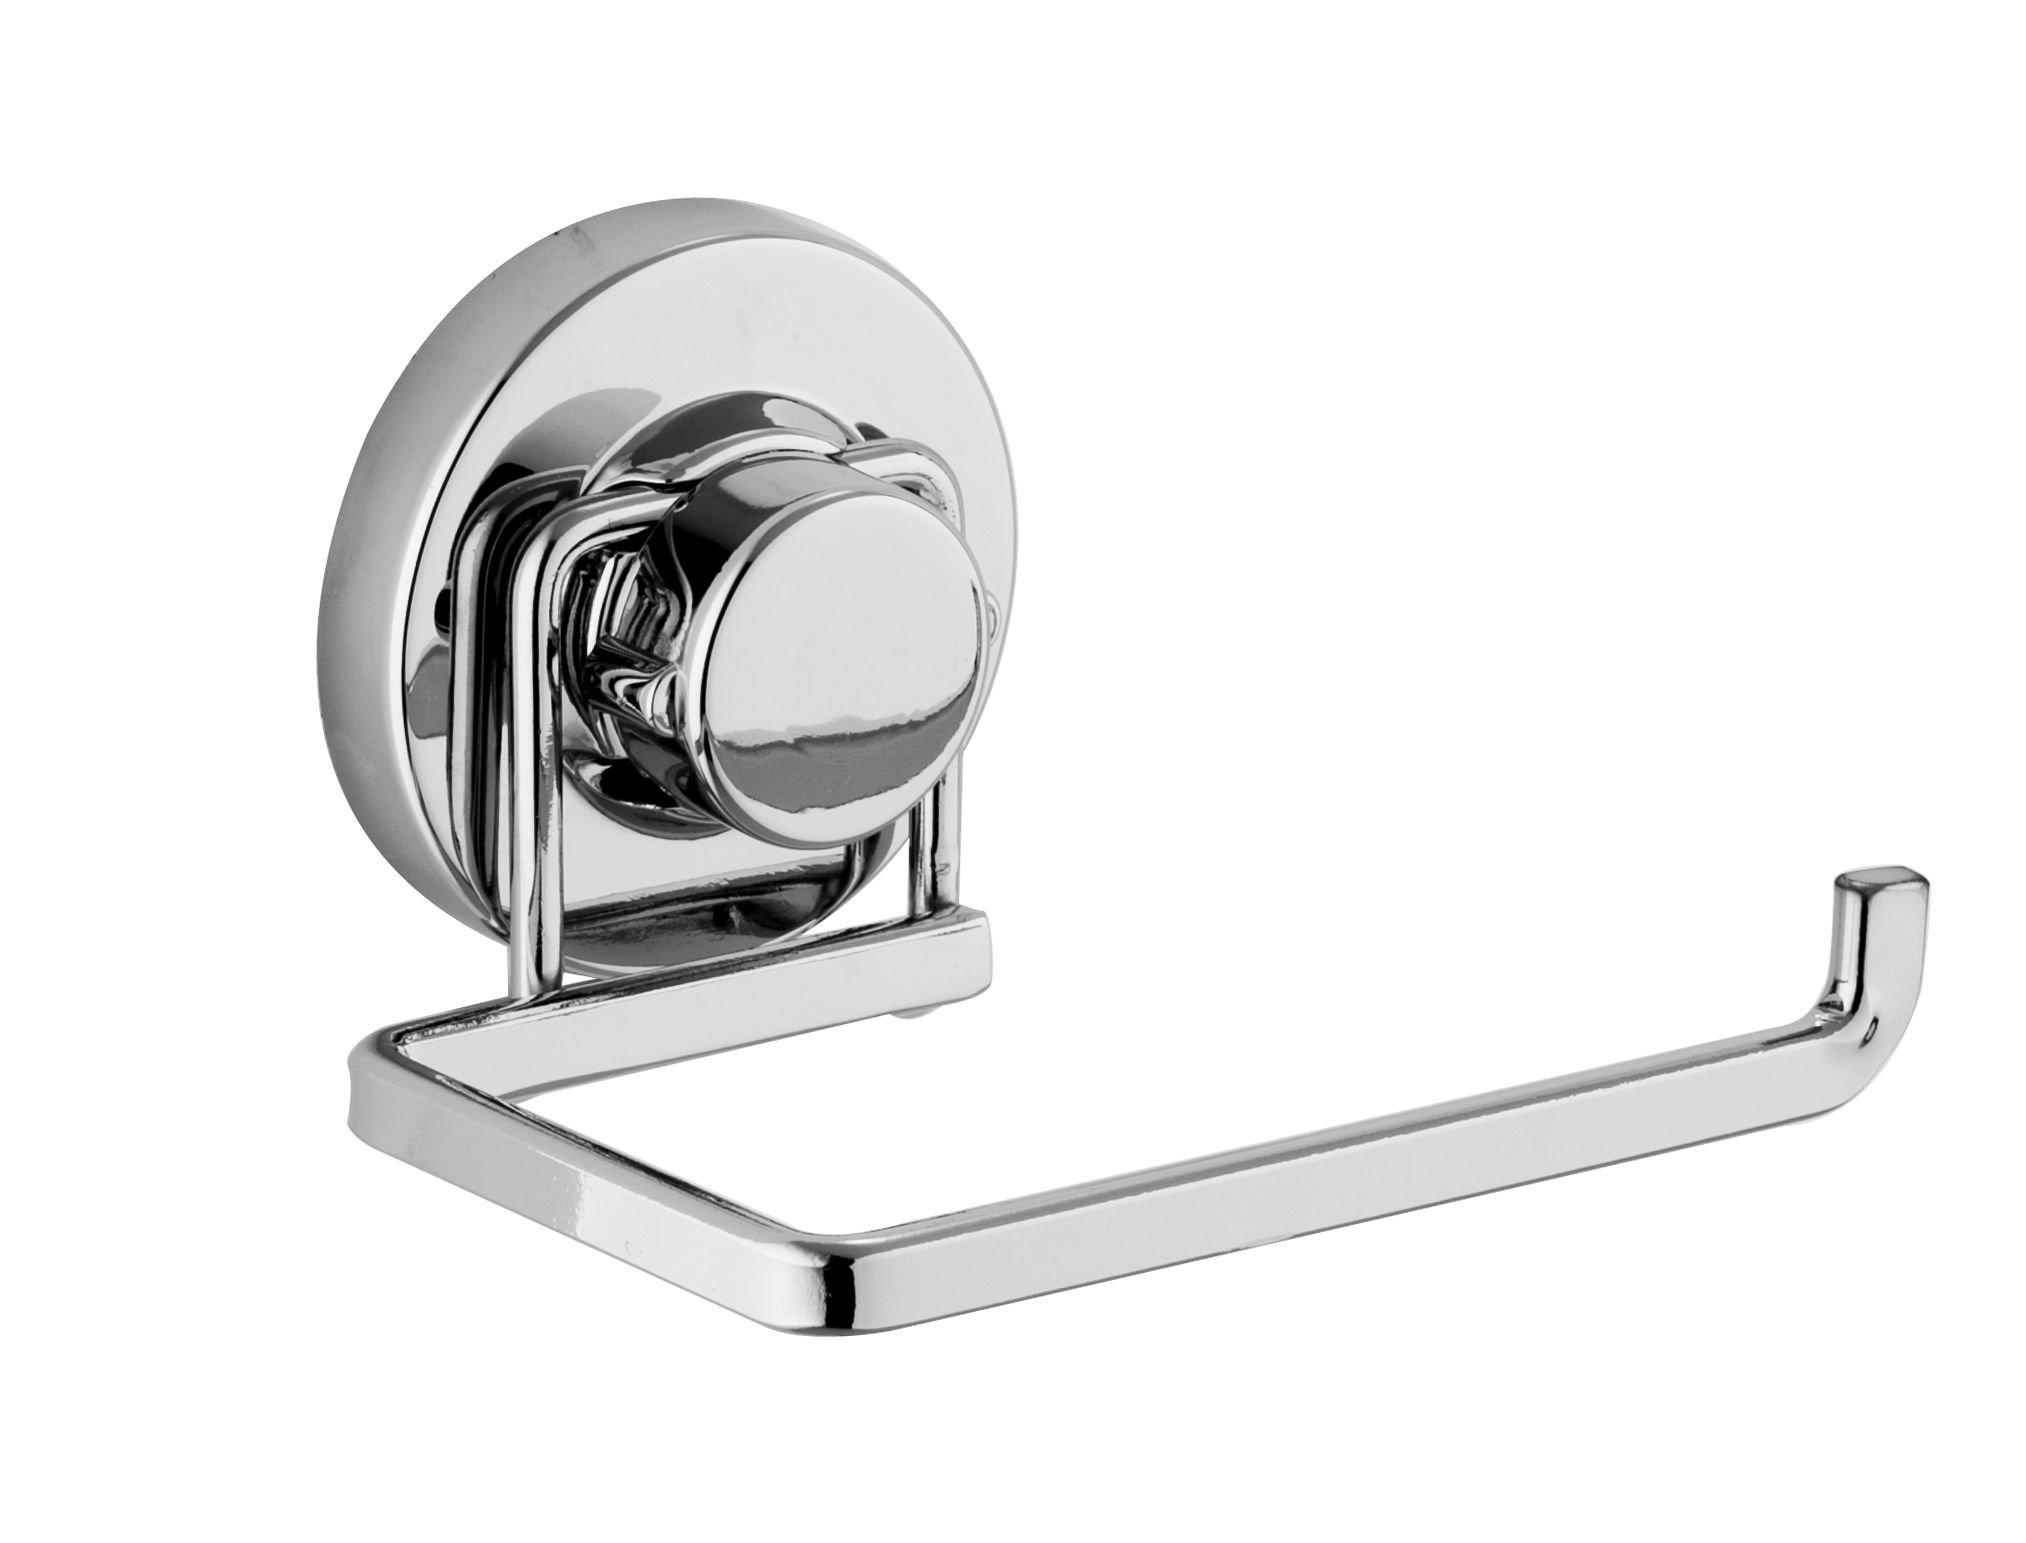 Oxo Bathroom Accessories Oxo Bathroom Accessories Bathroom Accessories Bath Compact Toilet